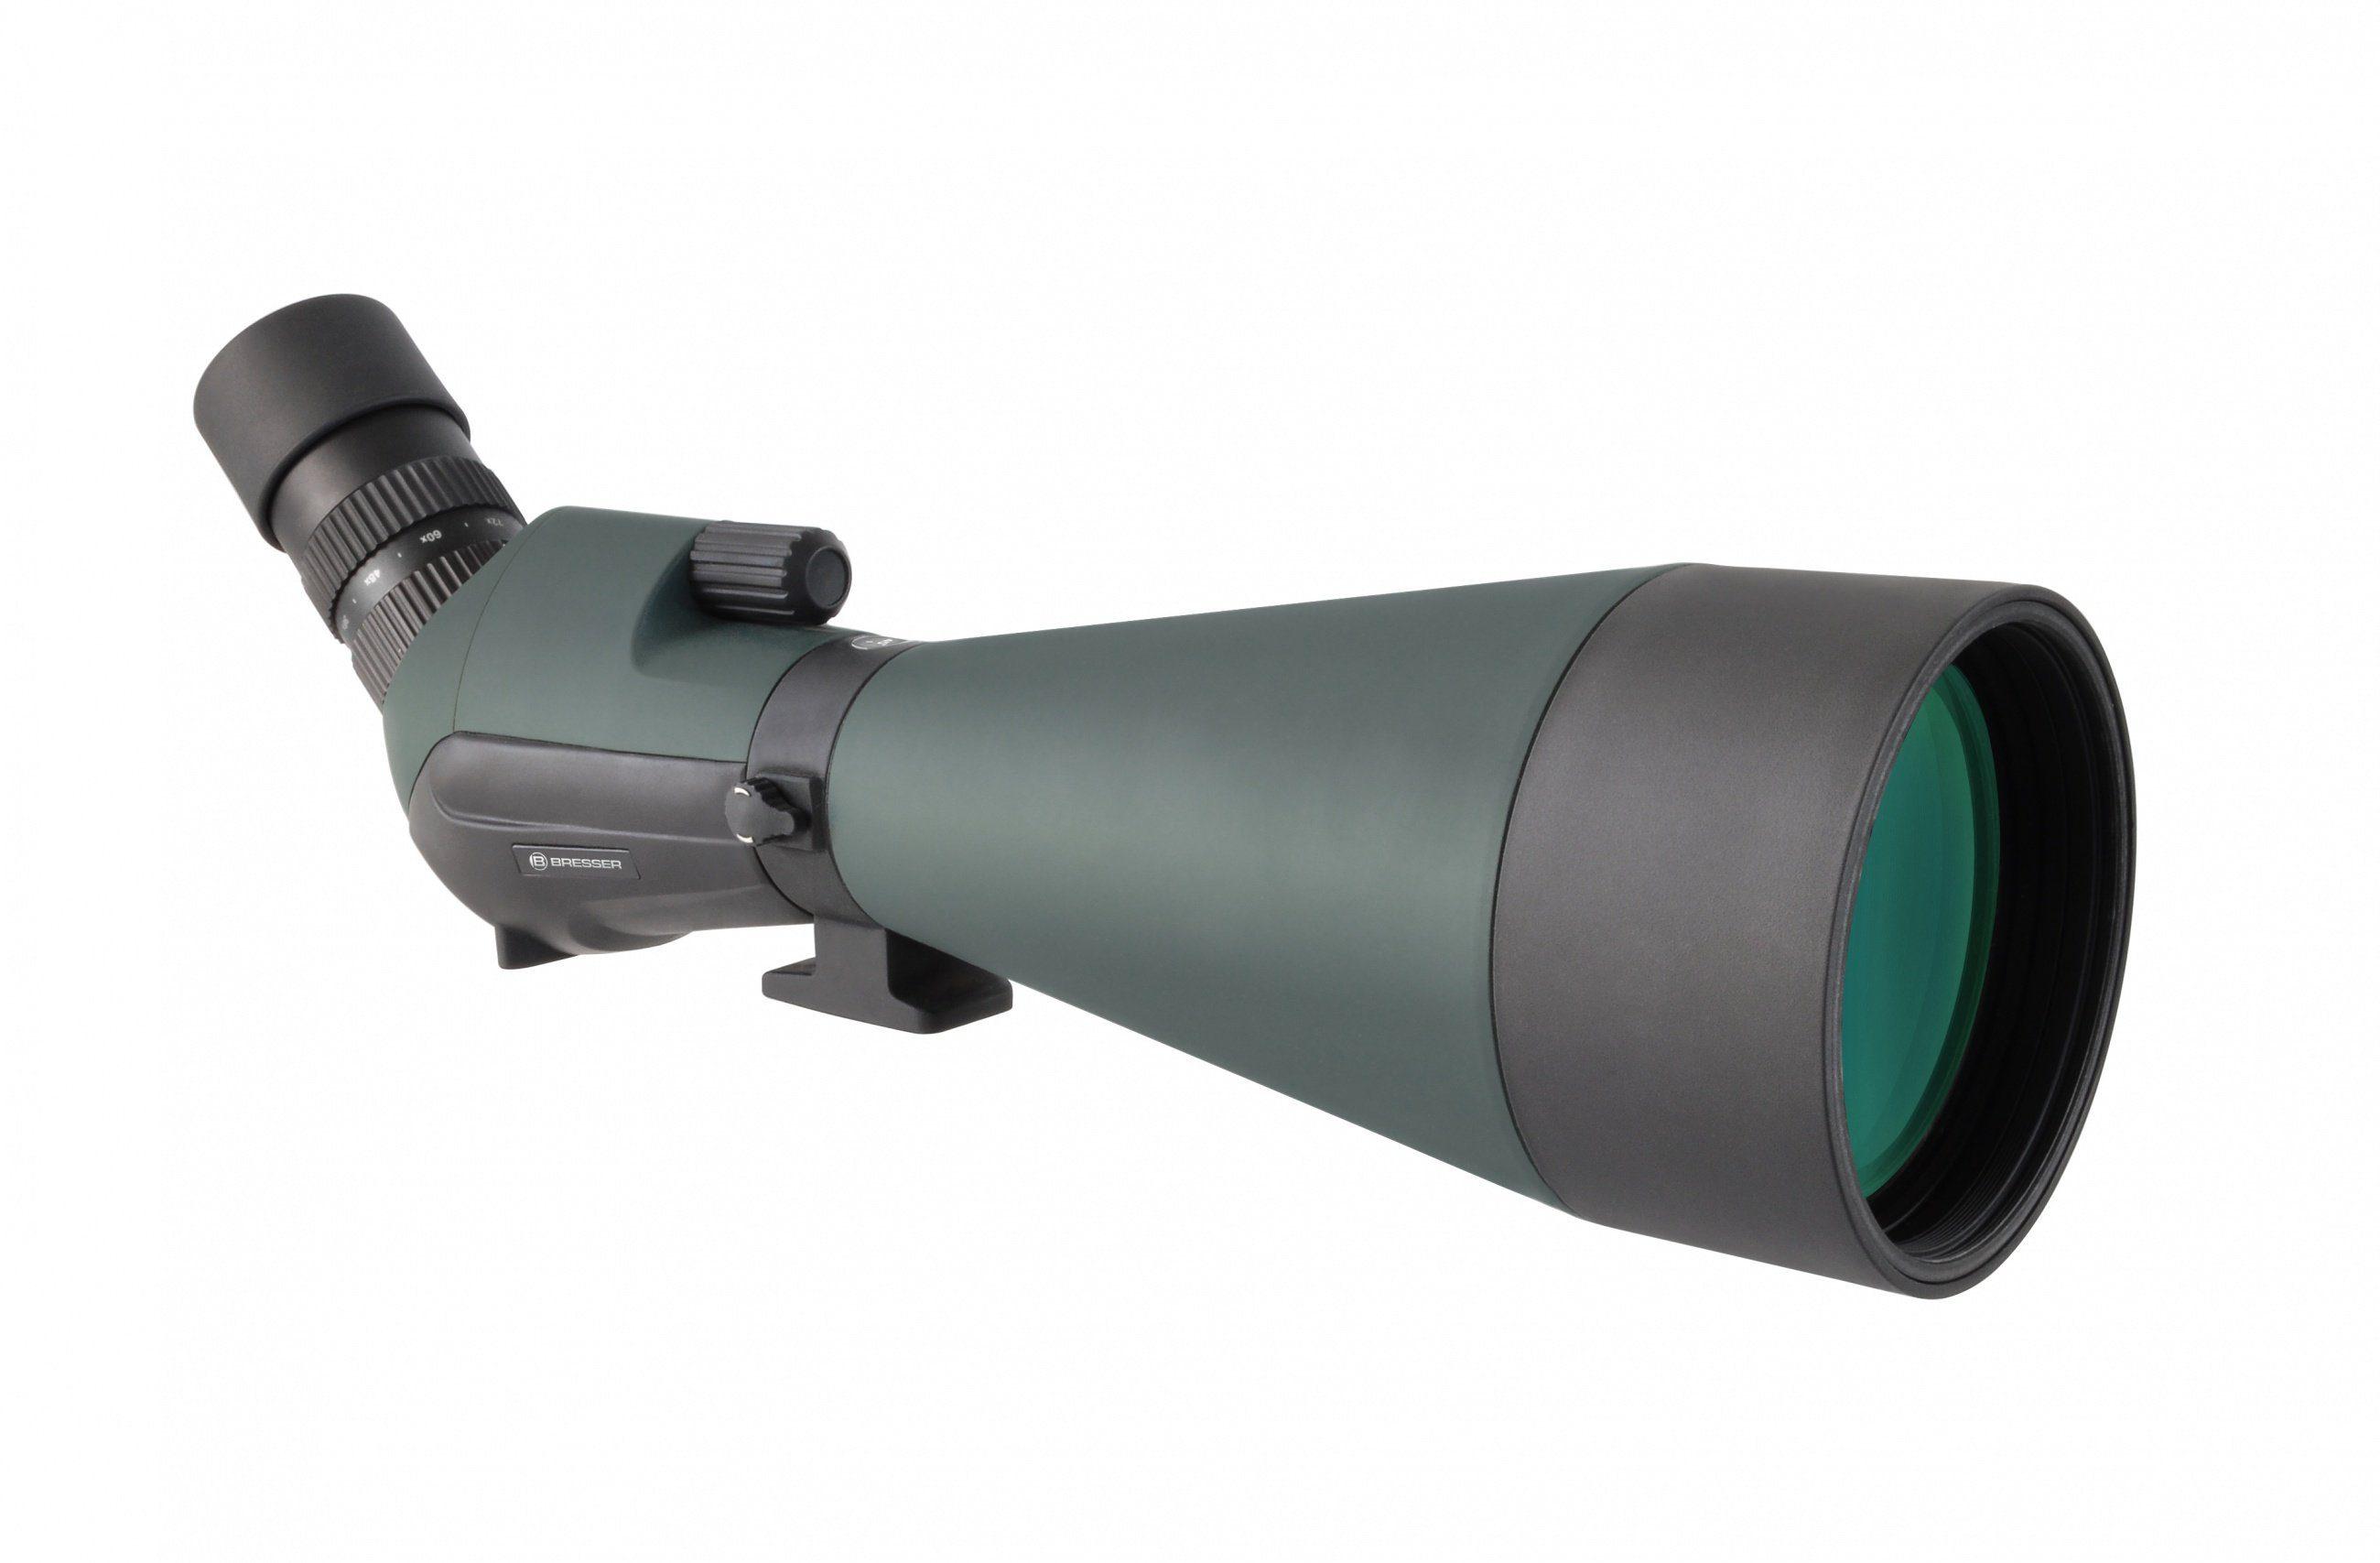 Bresser Spektiv »Condor 24-72x100 Spektiv«